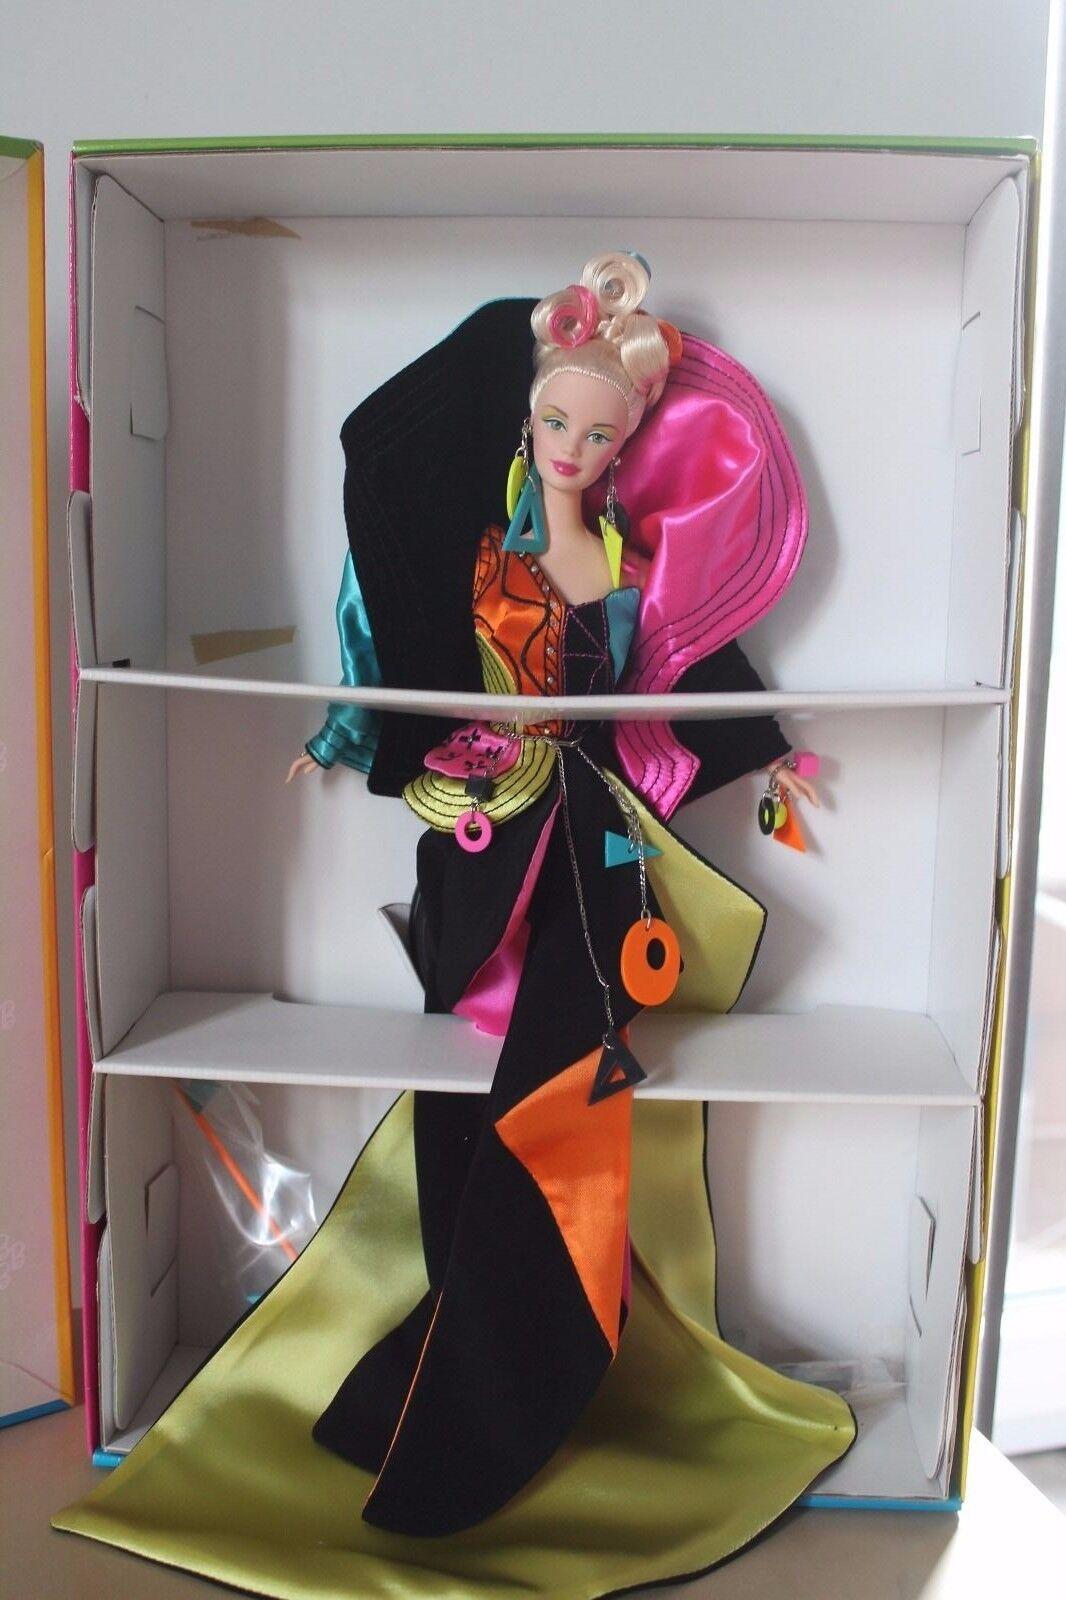 Barbie Masquerade Gala Collection Rendez-Vous Rendez-Vous Rendez-Vous Edition Mattel 1998 NRFB dae797